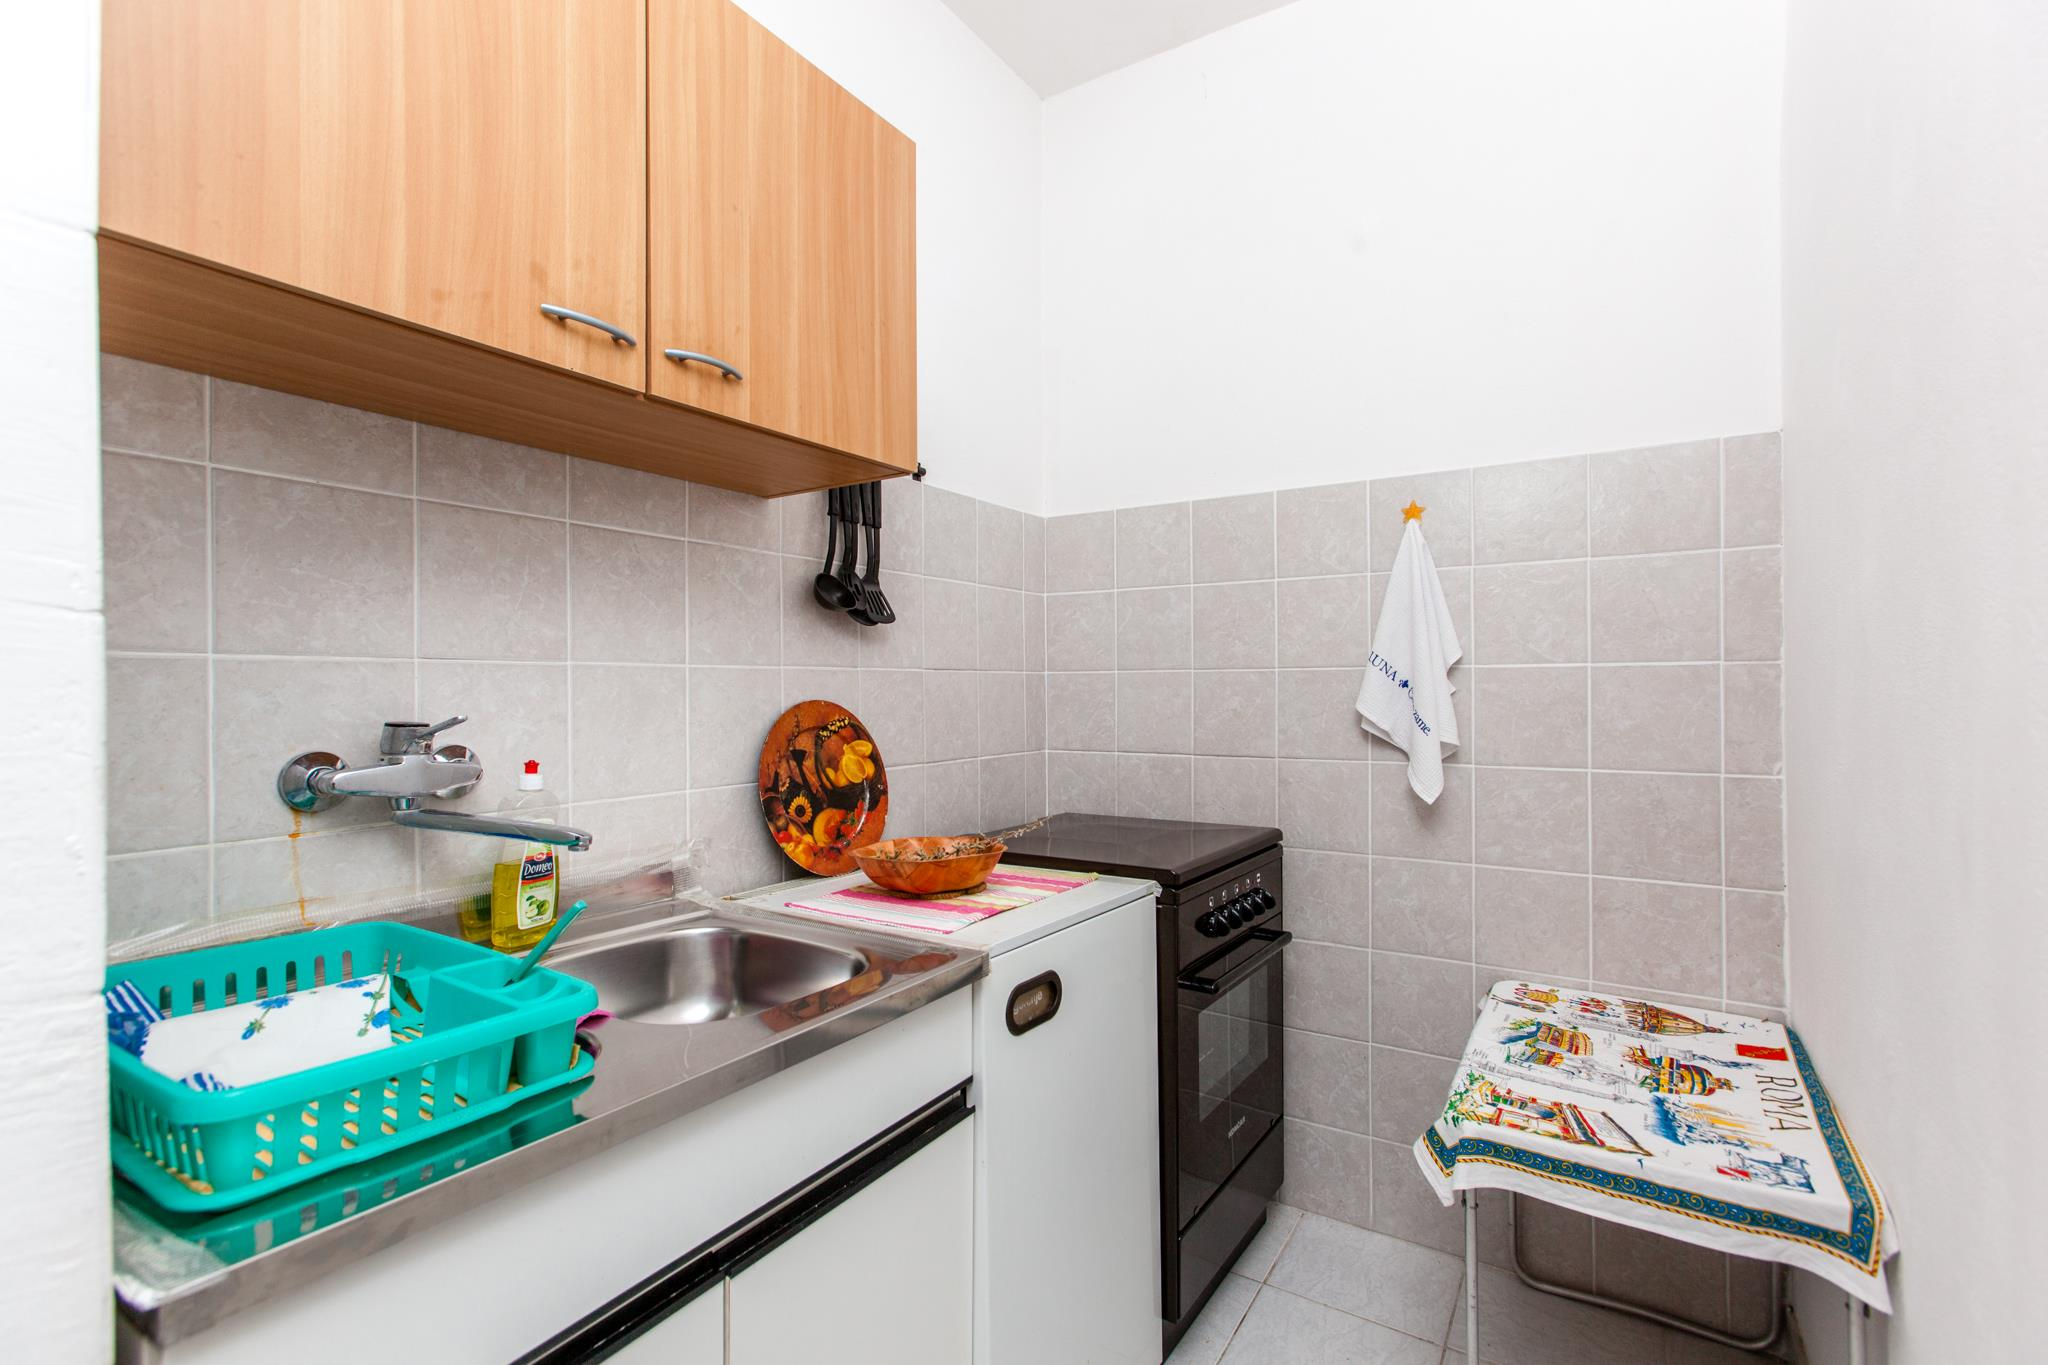 Ferienwohnung Apartments Bla~enka / A2 / One Bedroom (1927875), Lokva Rogoznica, , Dalmatien, Kroatien, Bild 5